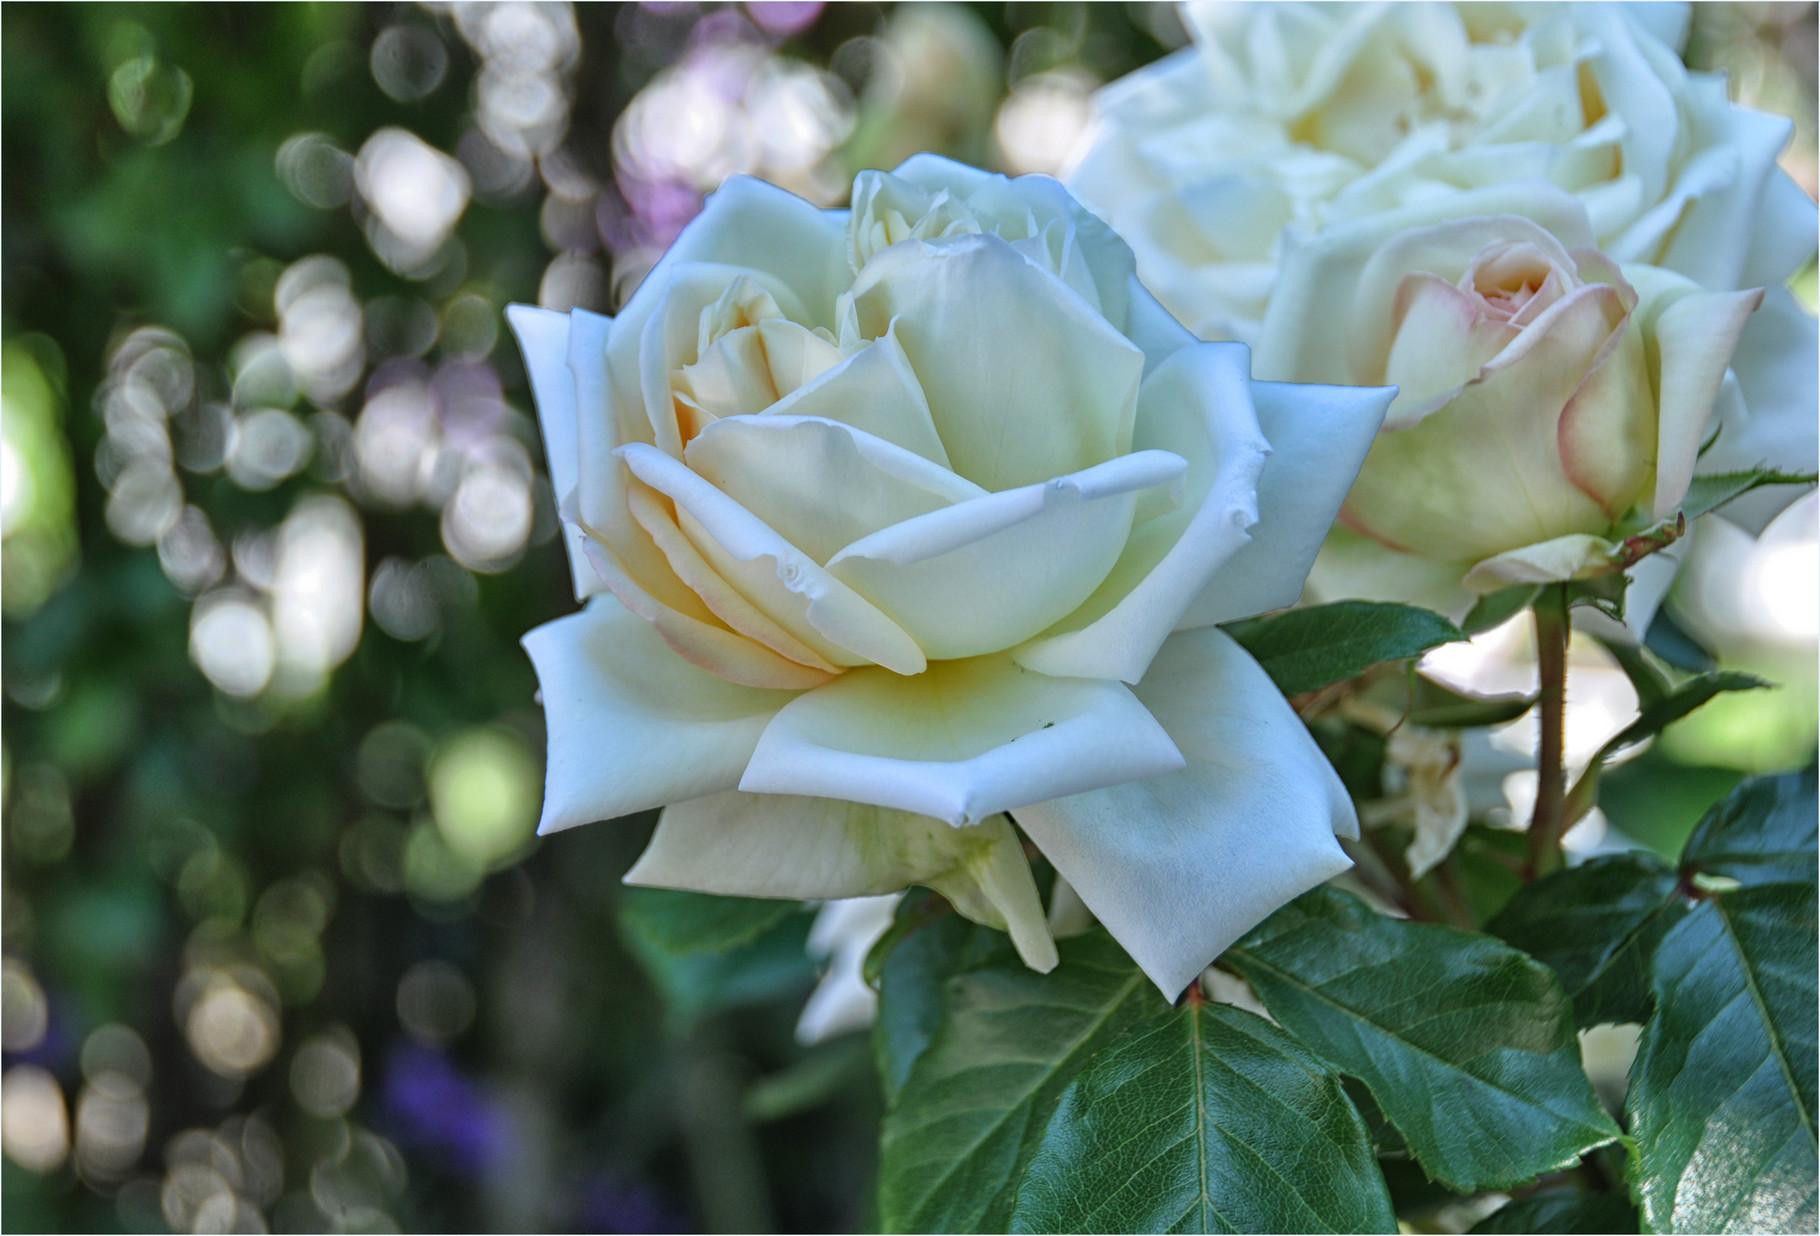 Rosen in Nachbars Garten II